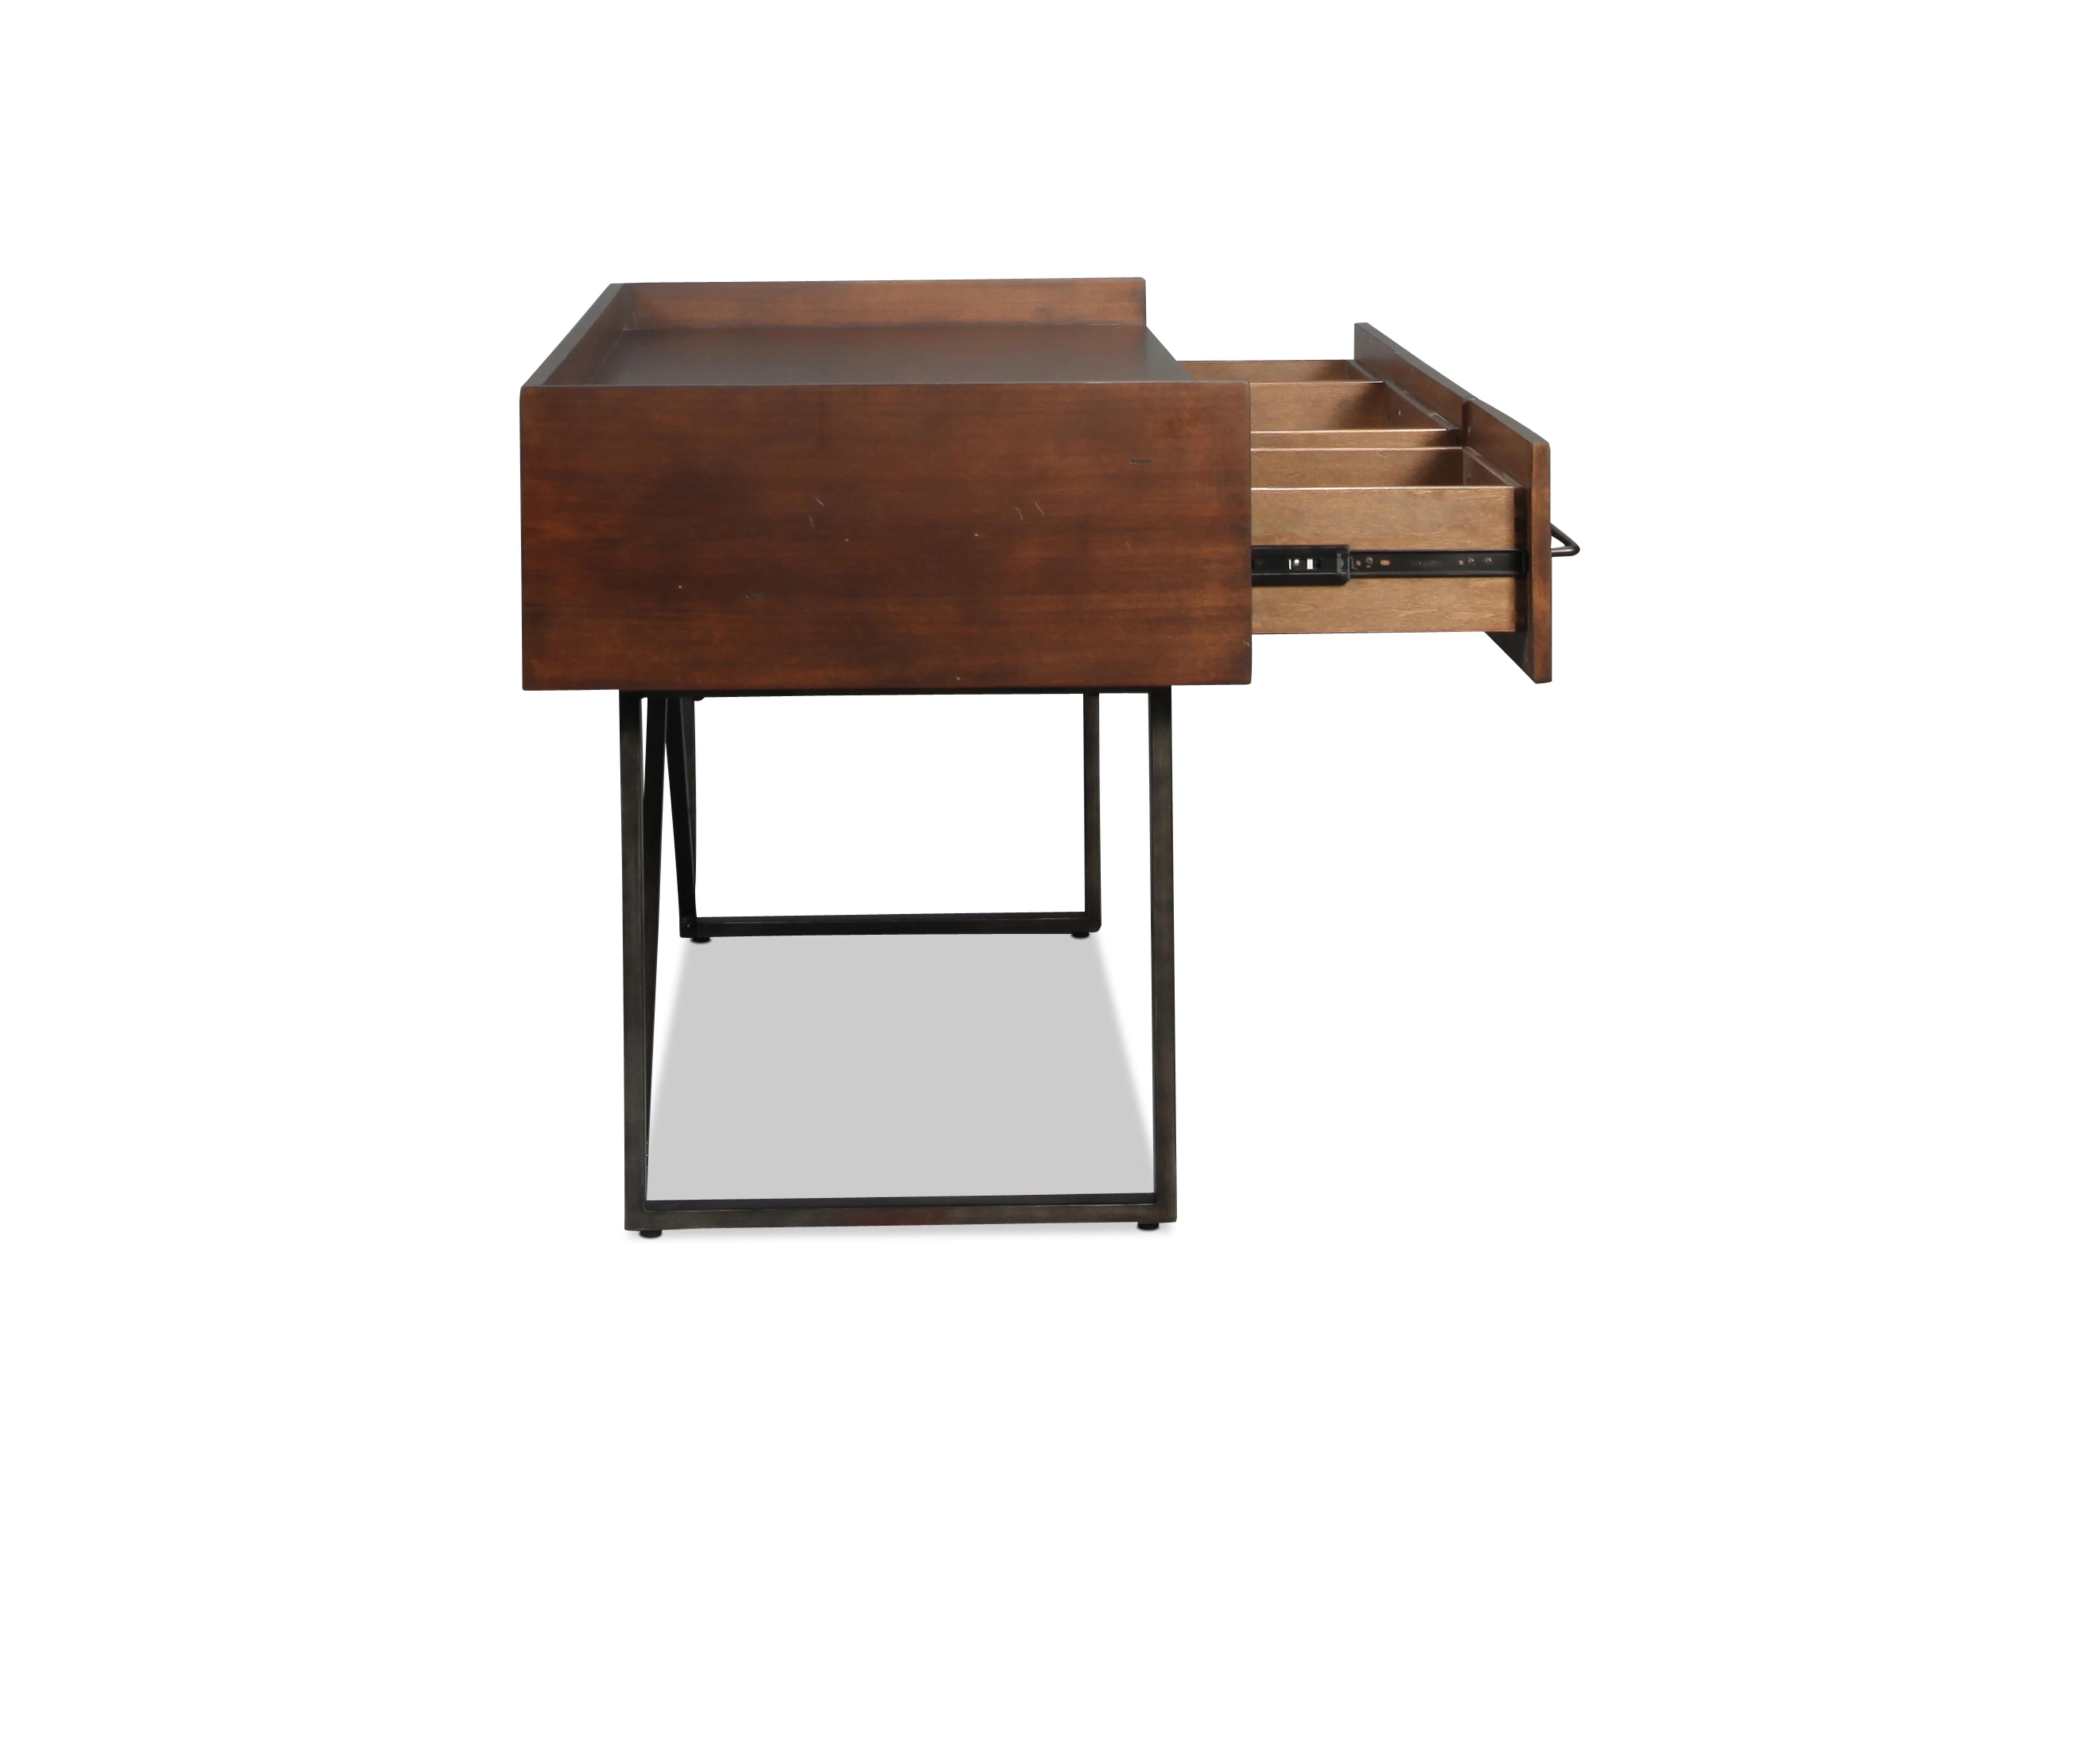 Chatswin Desk Levin Furniture